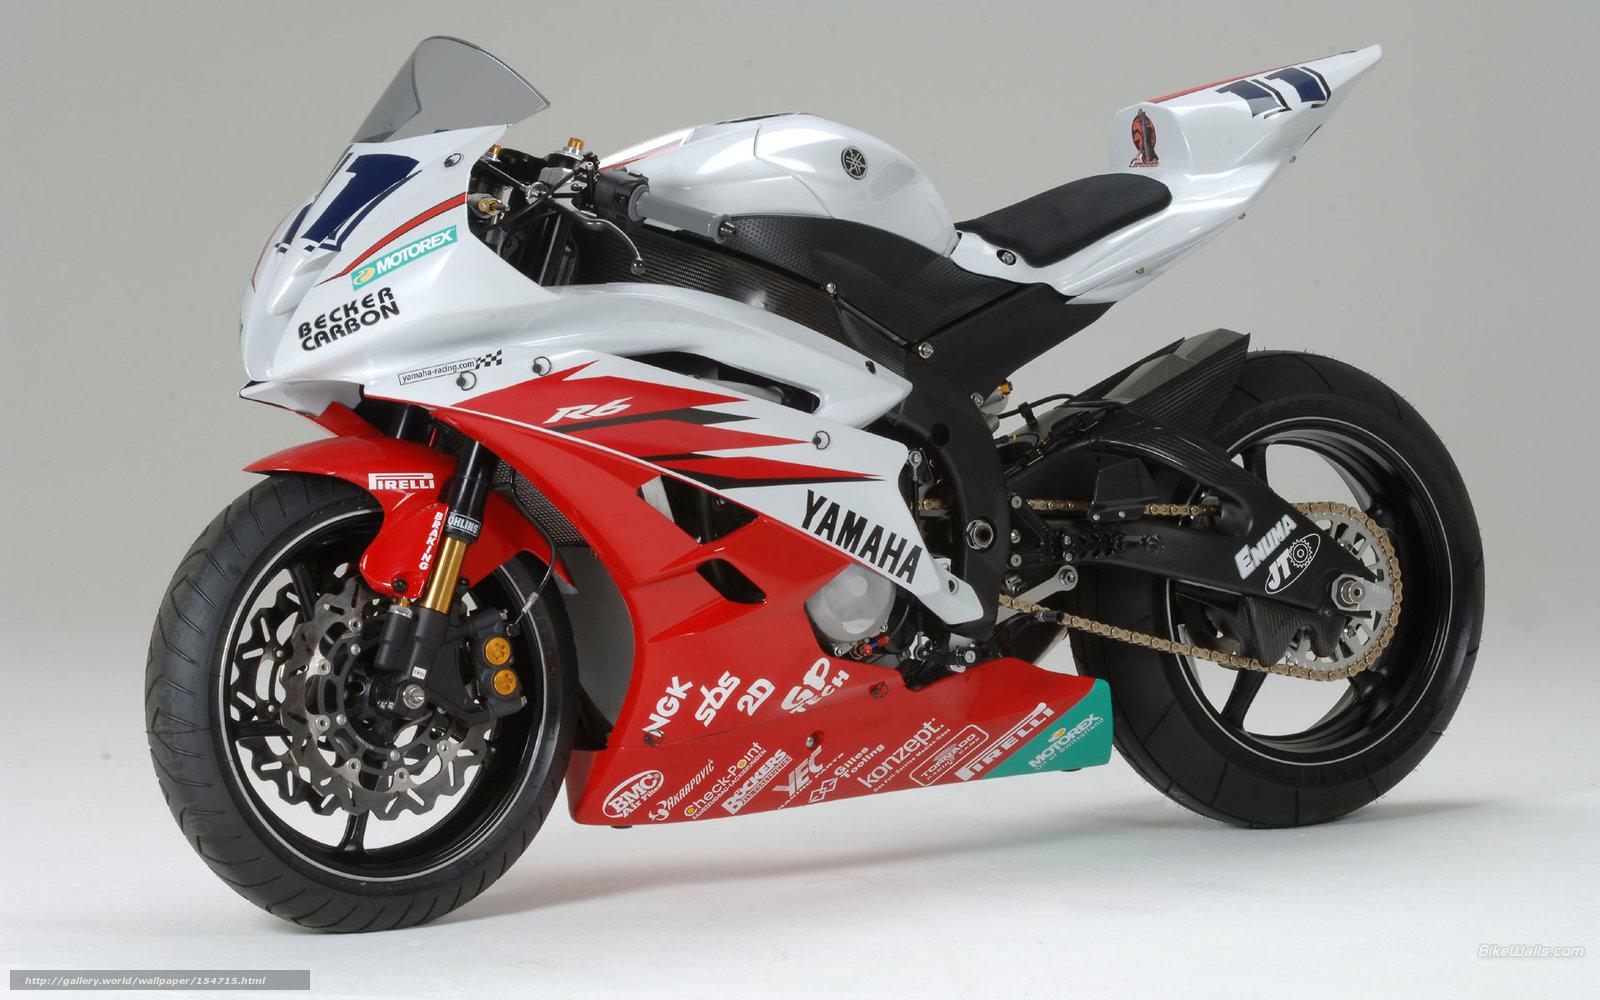 descargar gratis yamaha  super sport  yzf r6  yzf r6 2007 fondos de escritorio en la resolucin 2005 Yamaha R6 2005 Yamaha R6